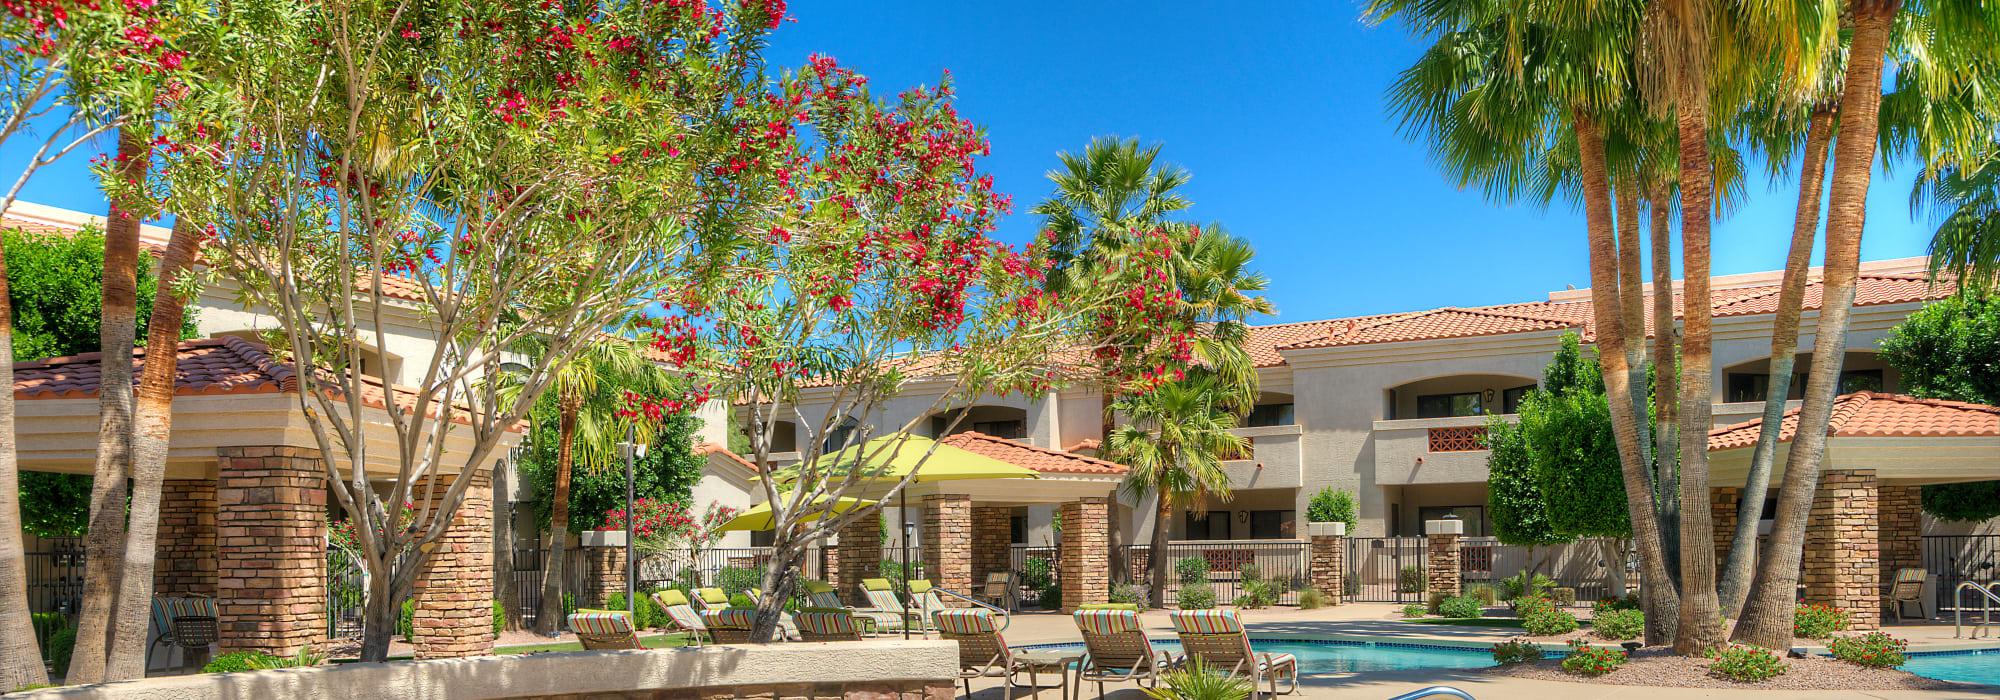 Beautiful landscaping surrounds San Prado in Glendale, Arizona